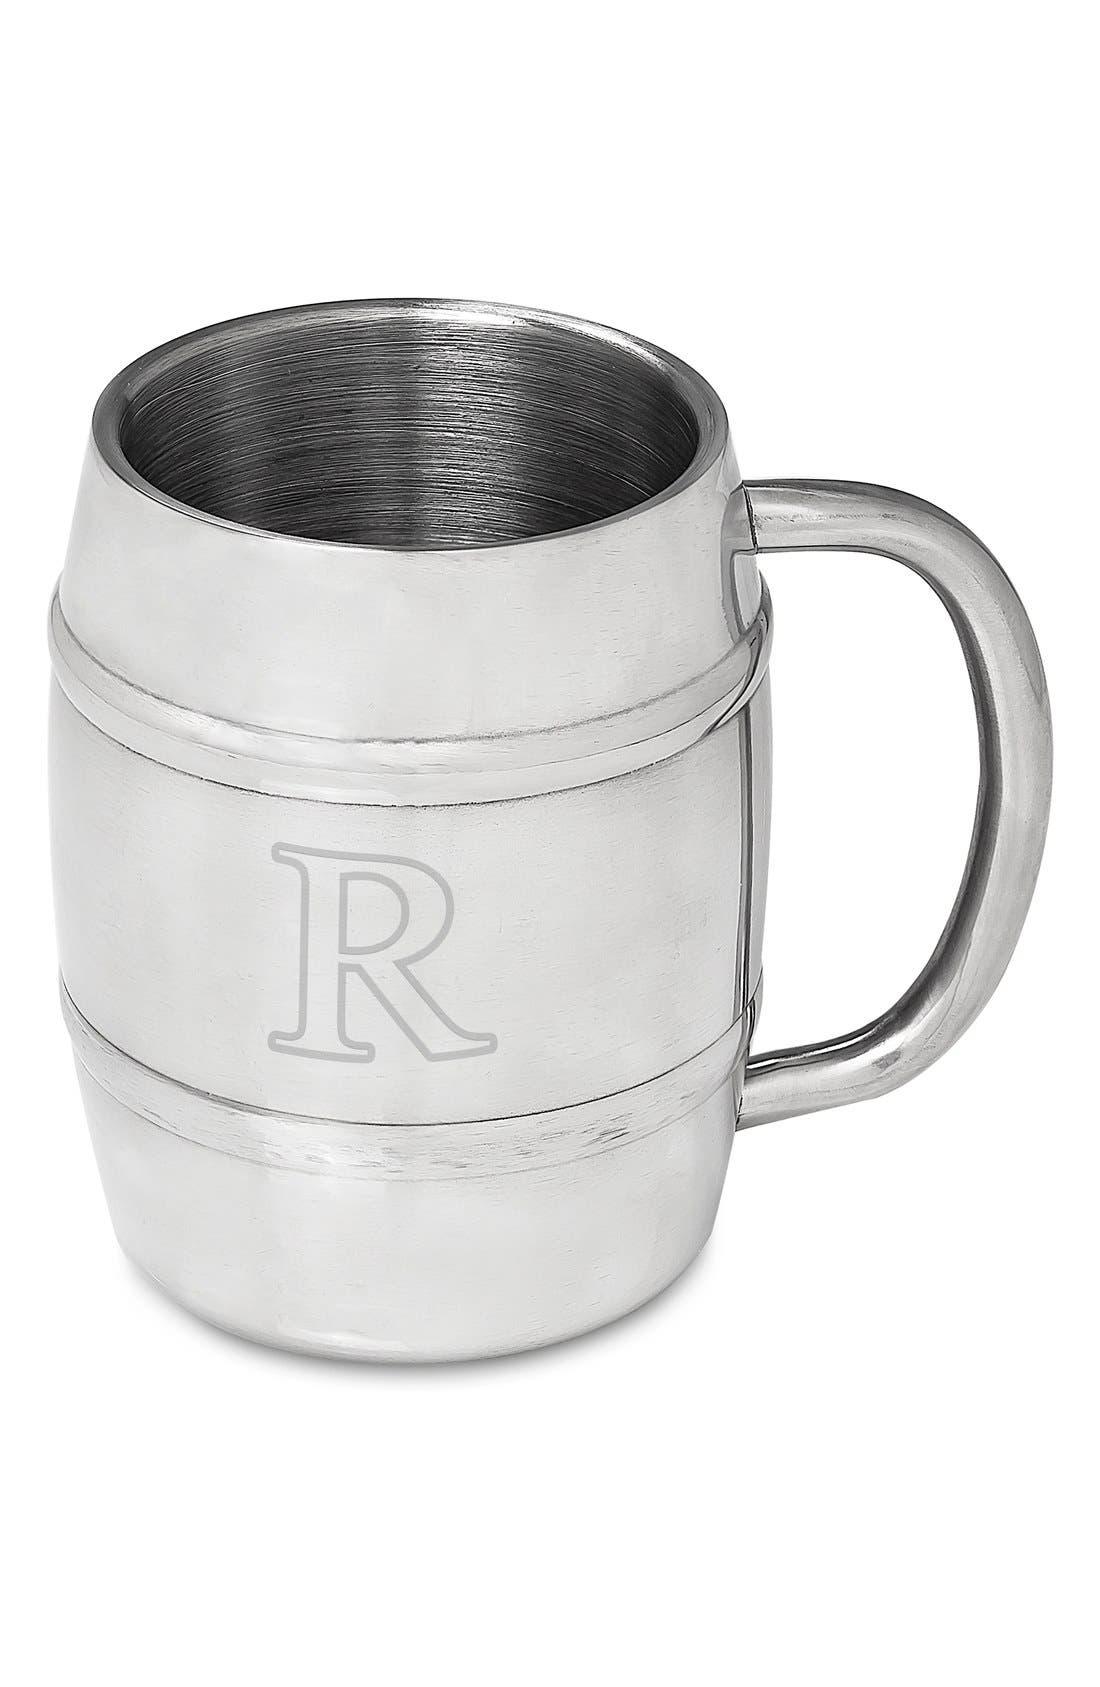 Monogram Stainless Steel Keg Mug,                             Main thumbnail 20, color,